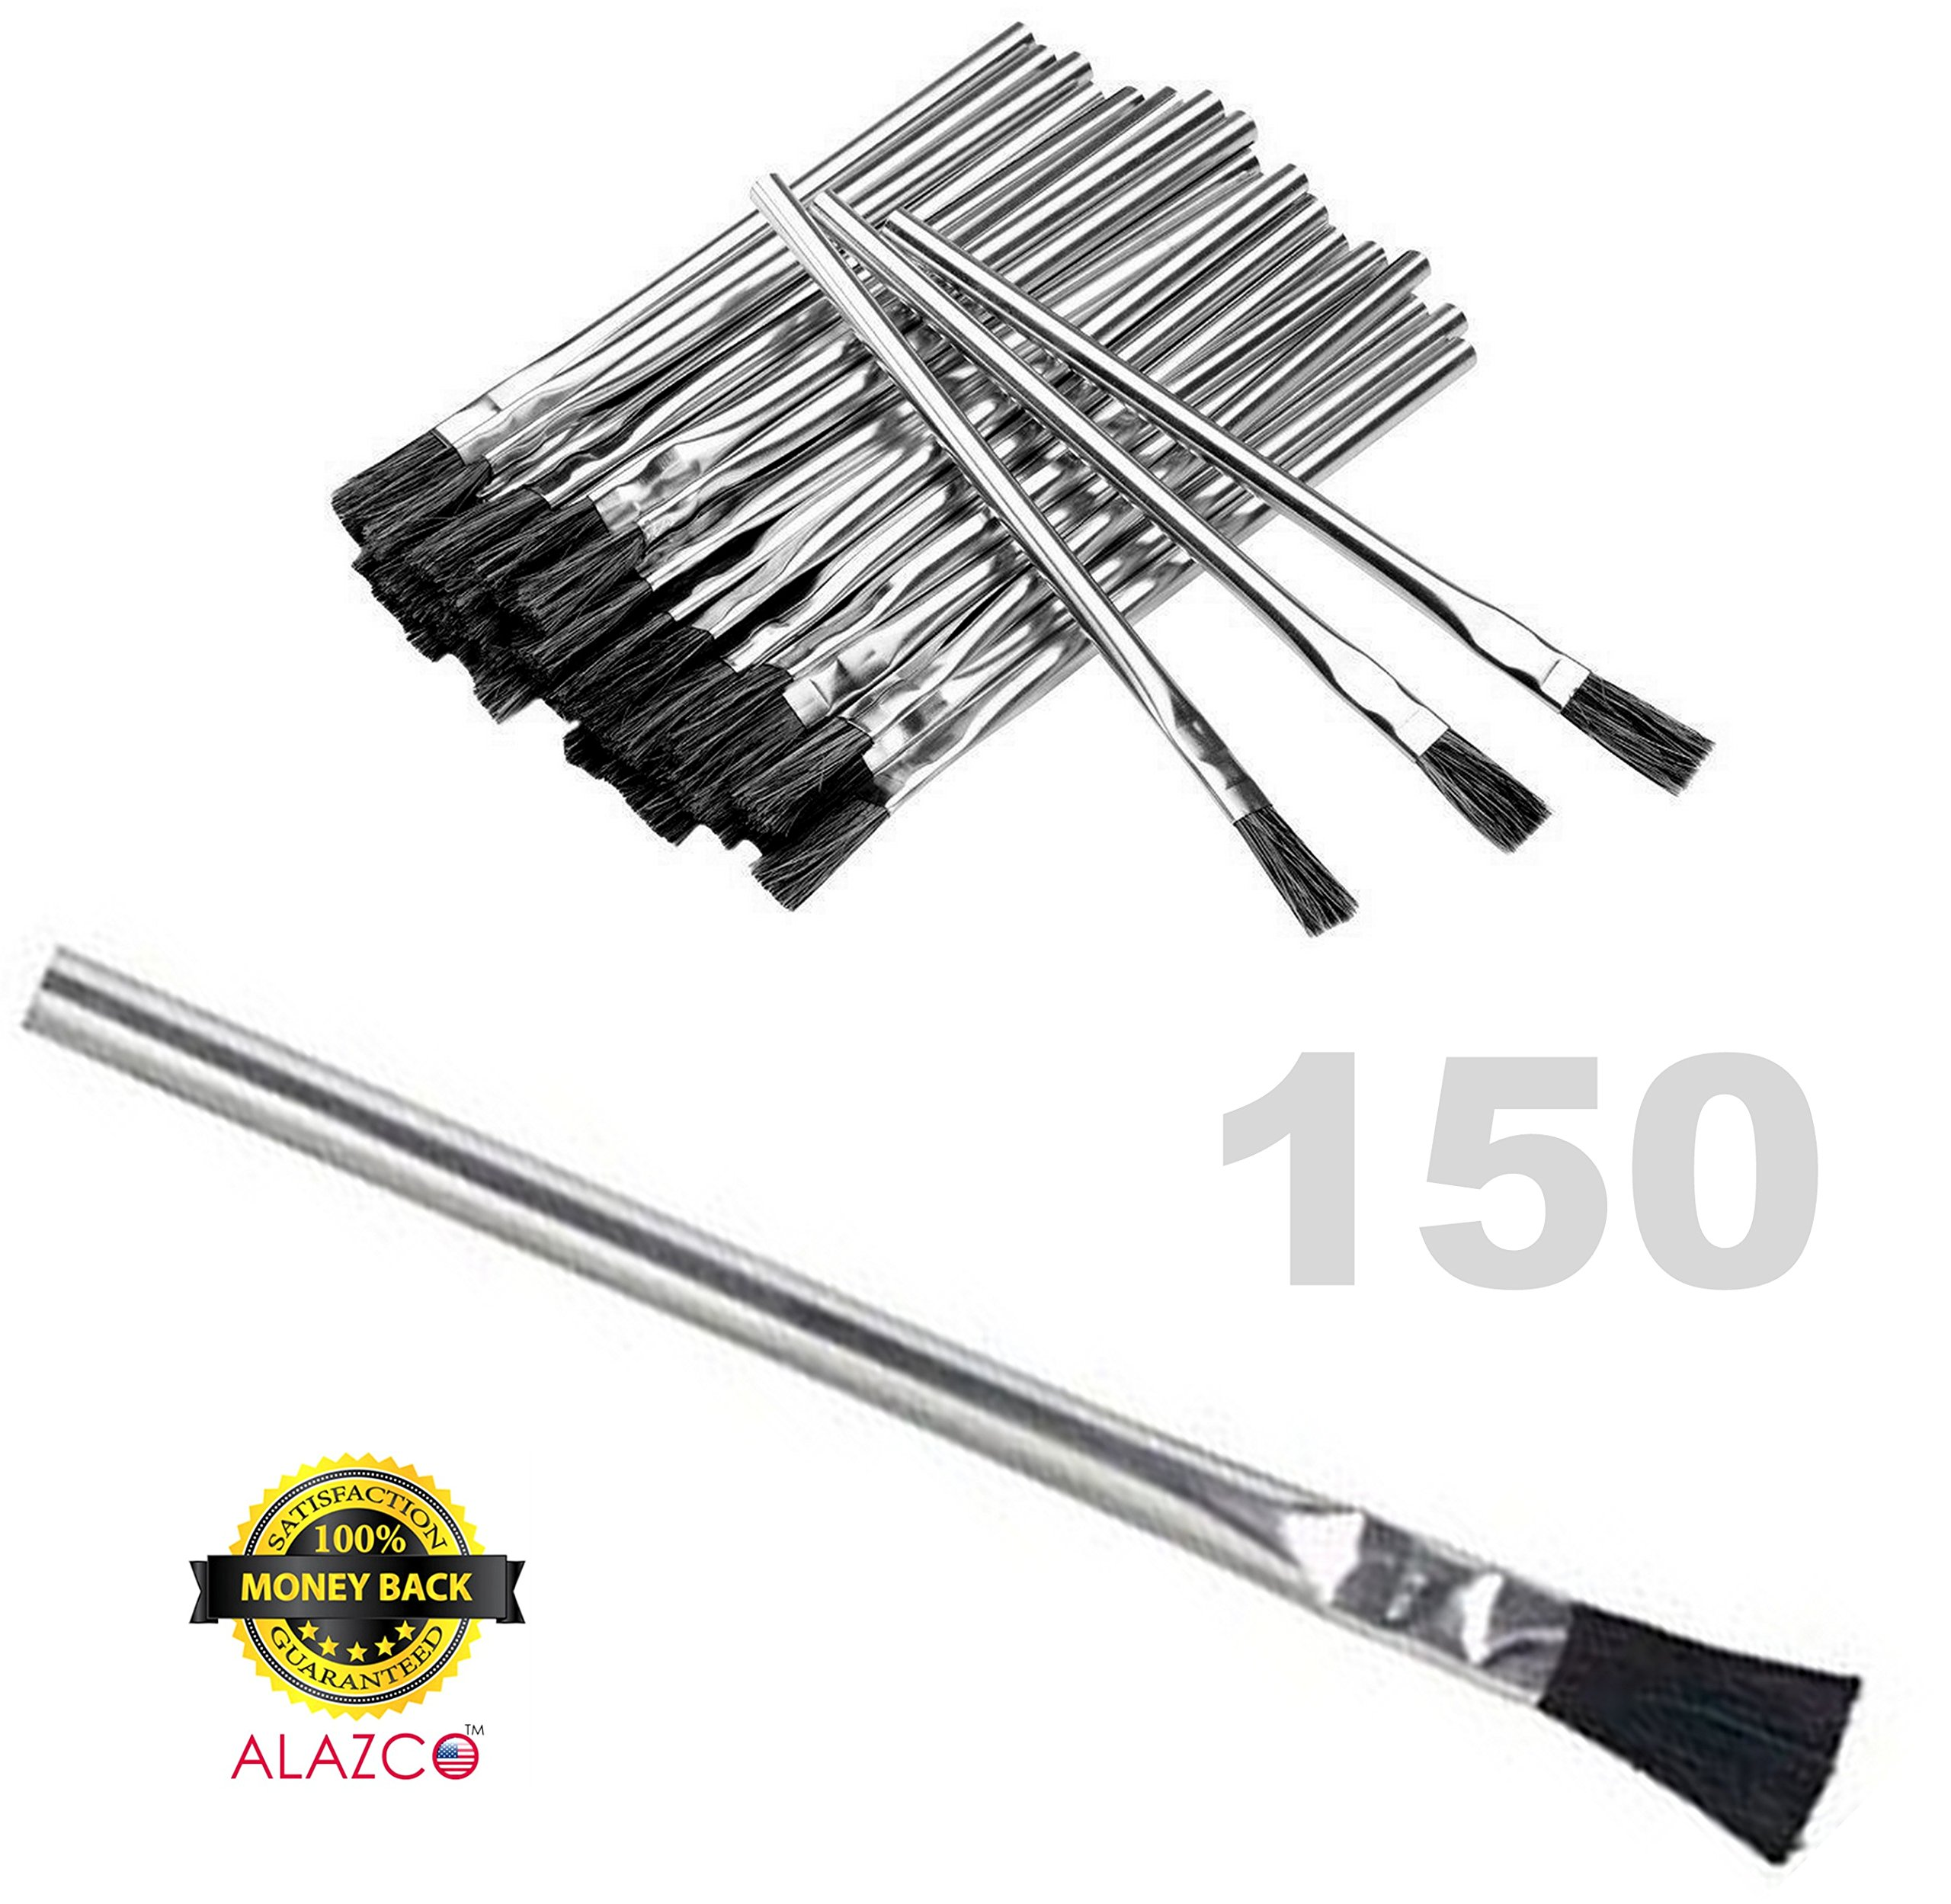 150pc ALAZCO 6'' Long 3/8'' Acid Brushes Natural Flexible Horsehair Bristles - Tin (Metal) Tubular Handles & Ferrules Home School Work Shop Garage